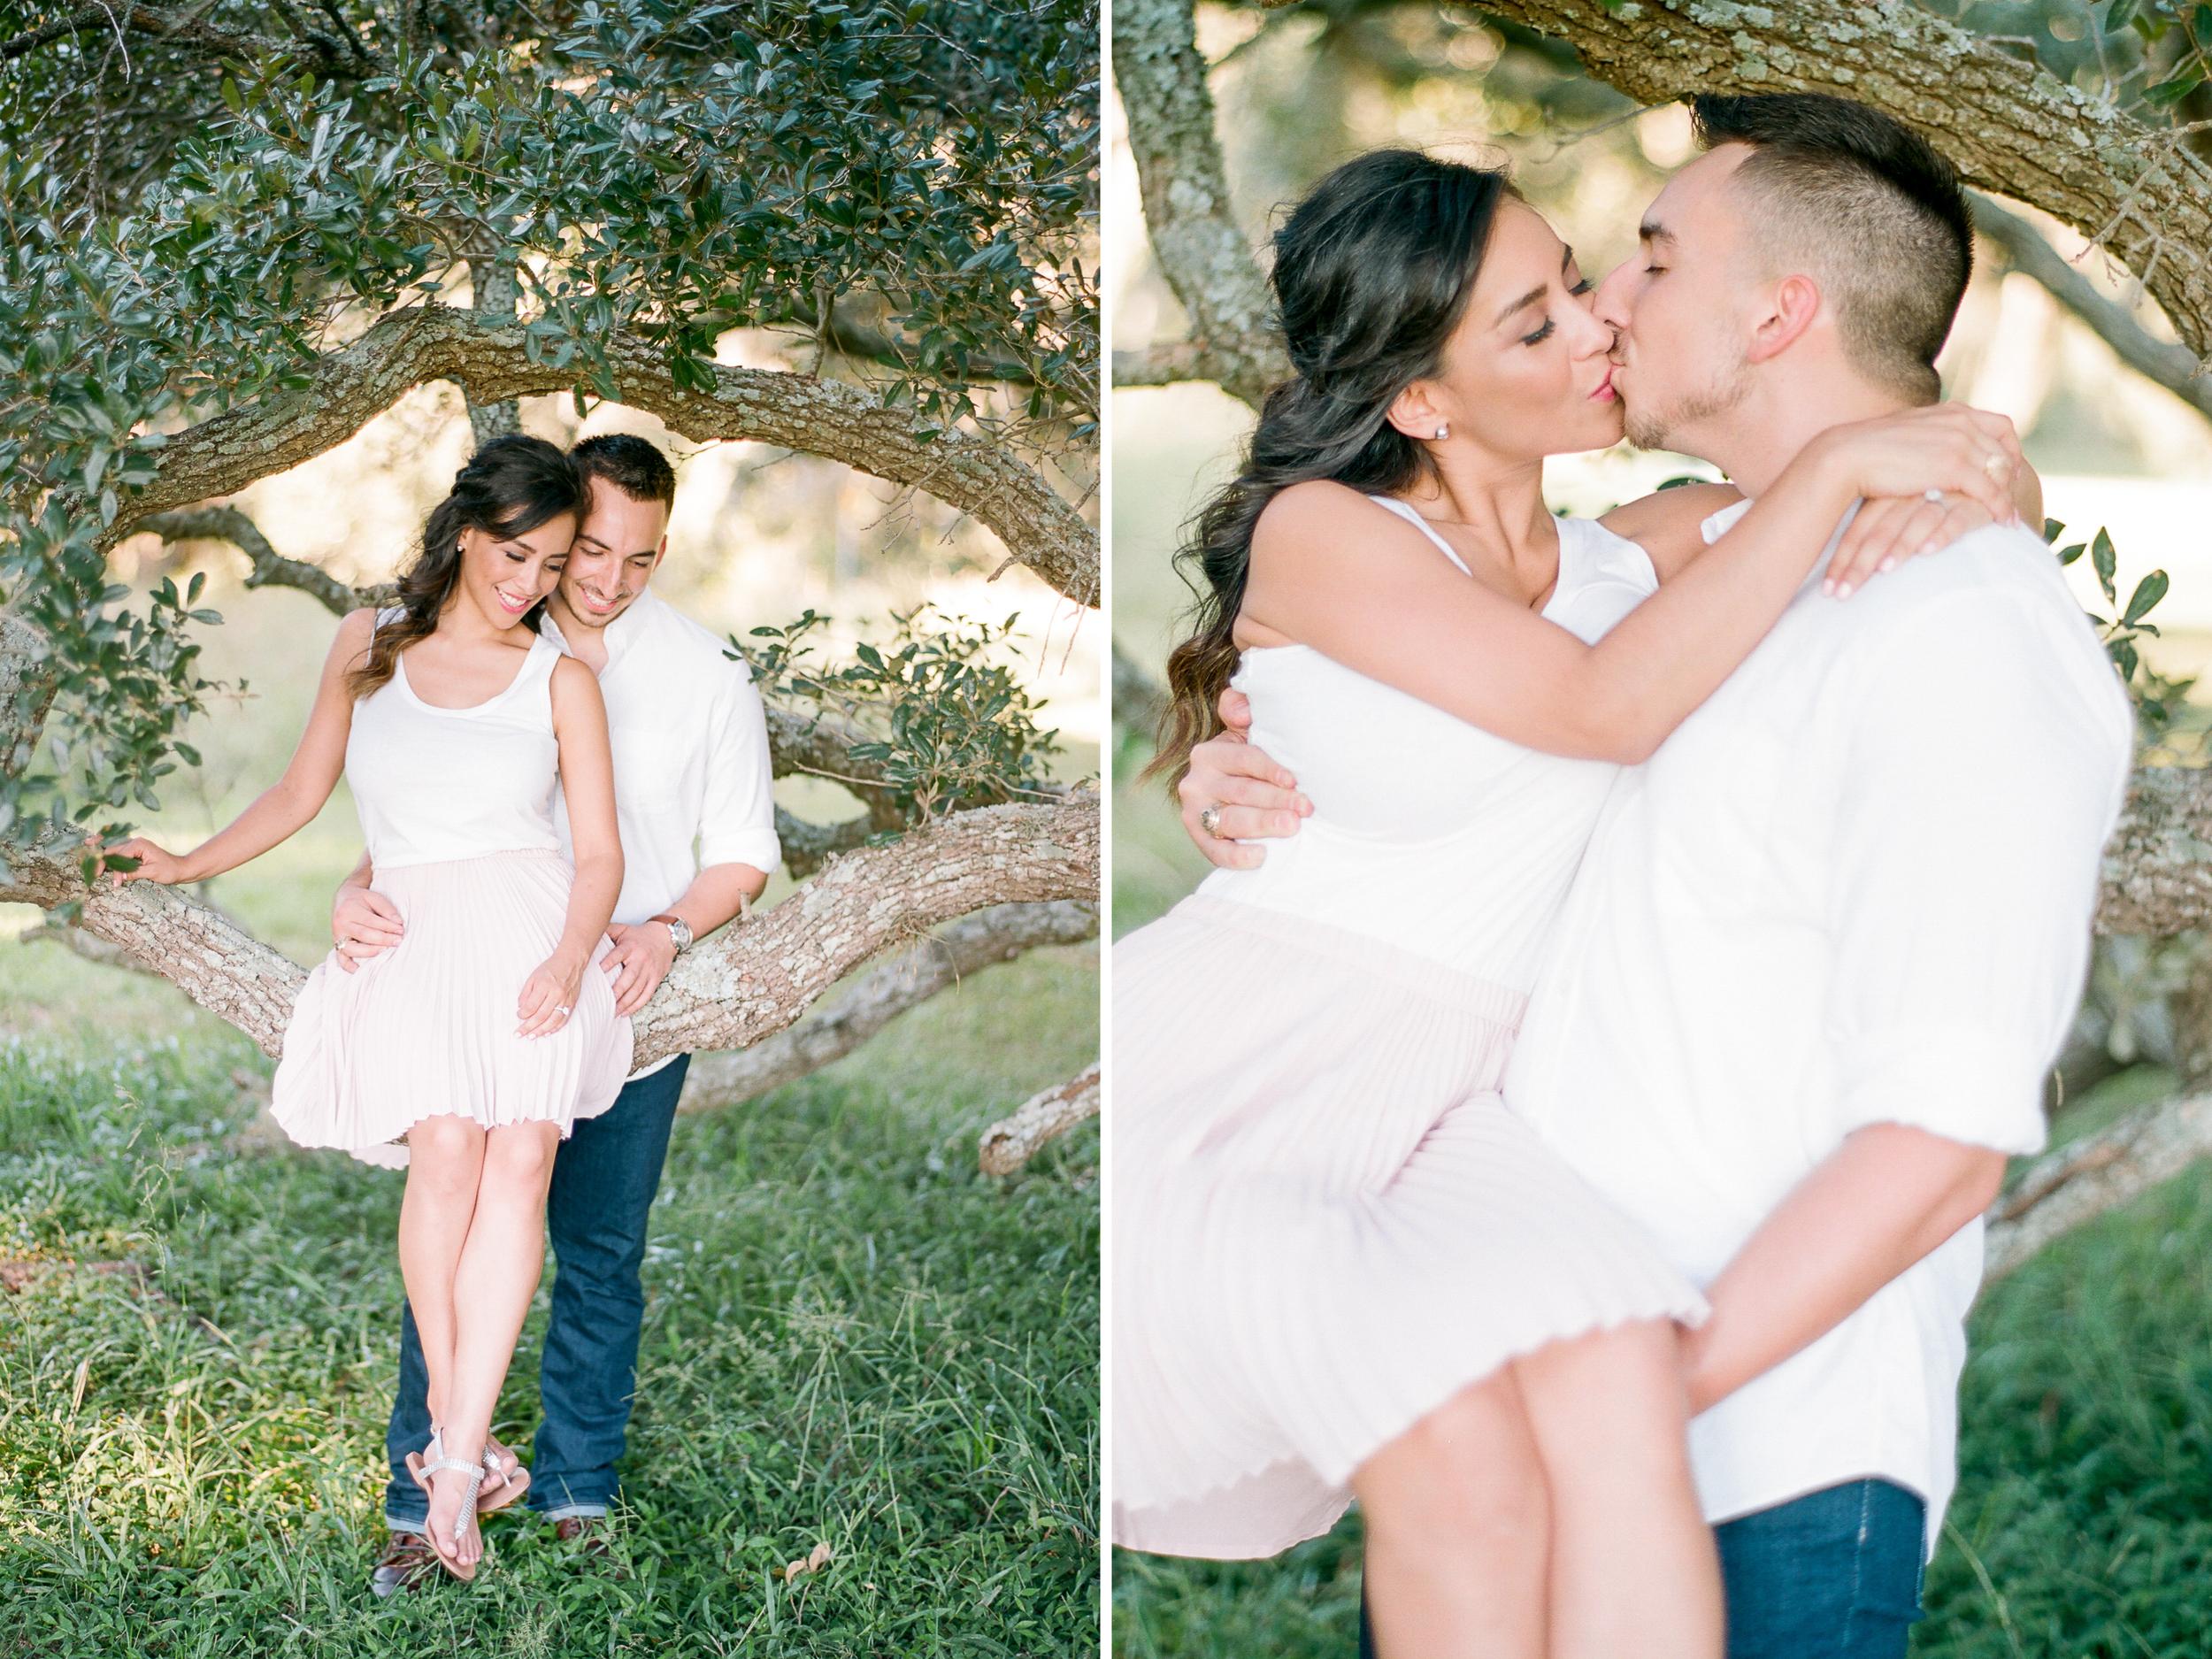 Dana-Fernandez-Photography-Houston-Wedding-Photographer-Film-Style-Me-Pretty-105.jpg